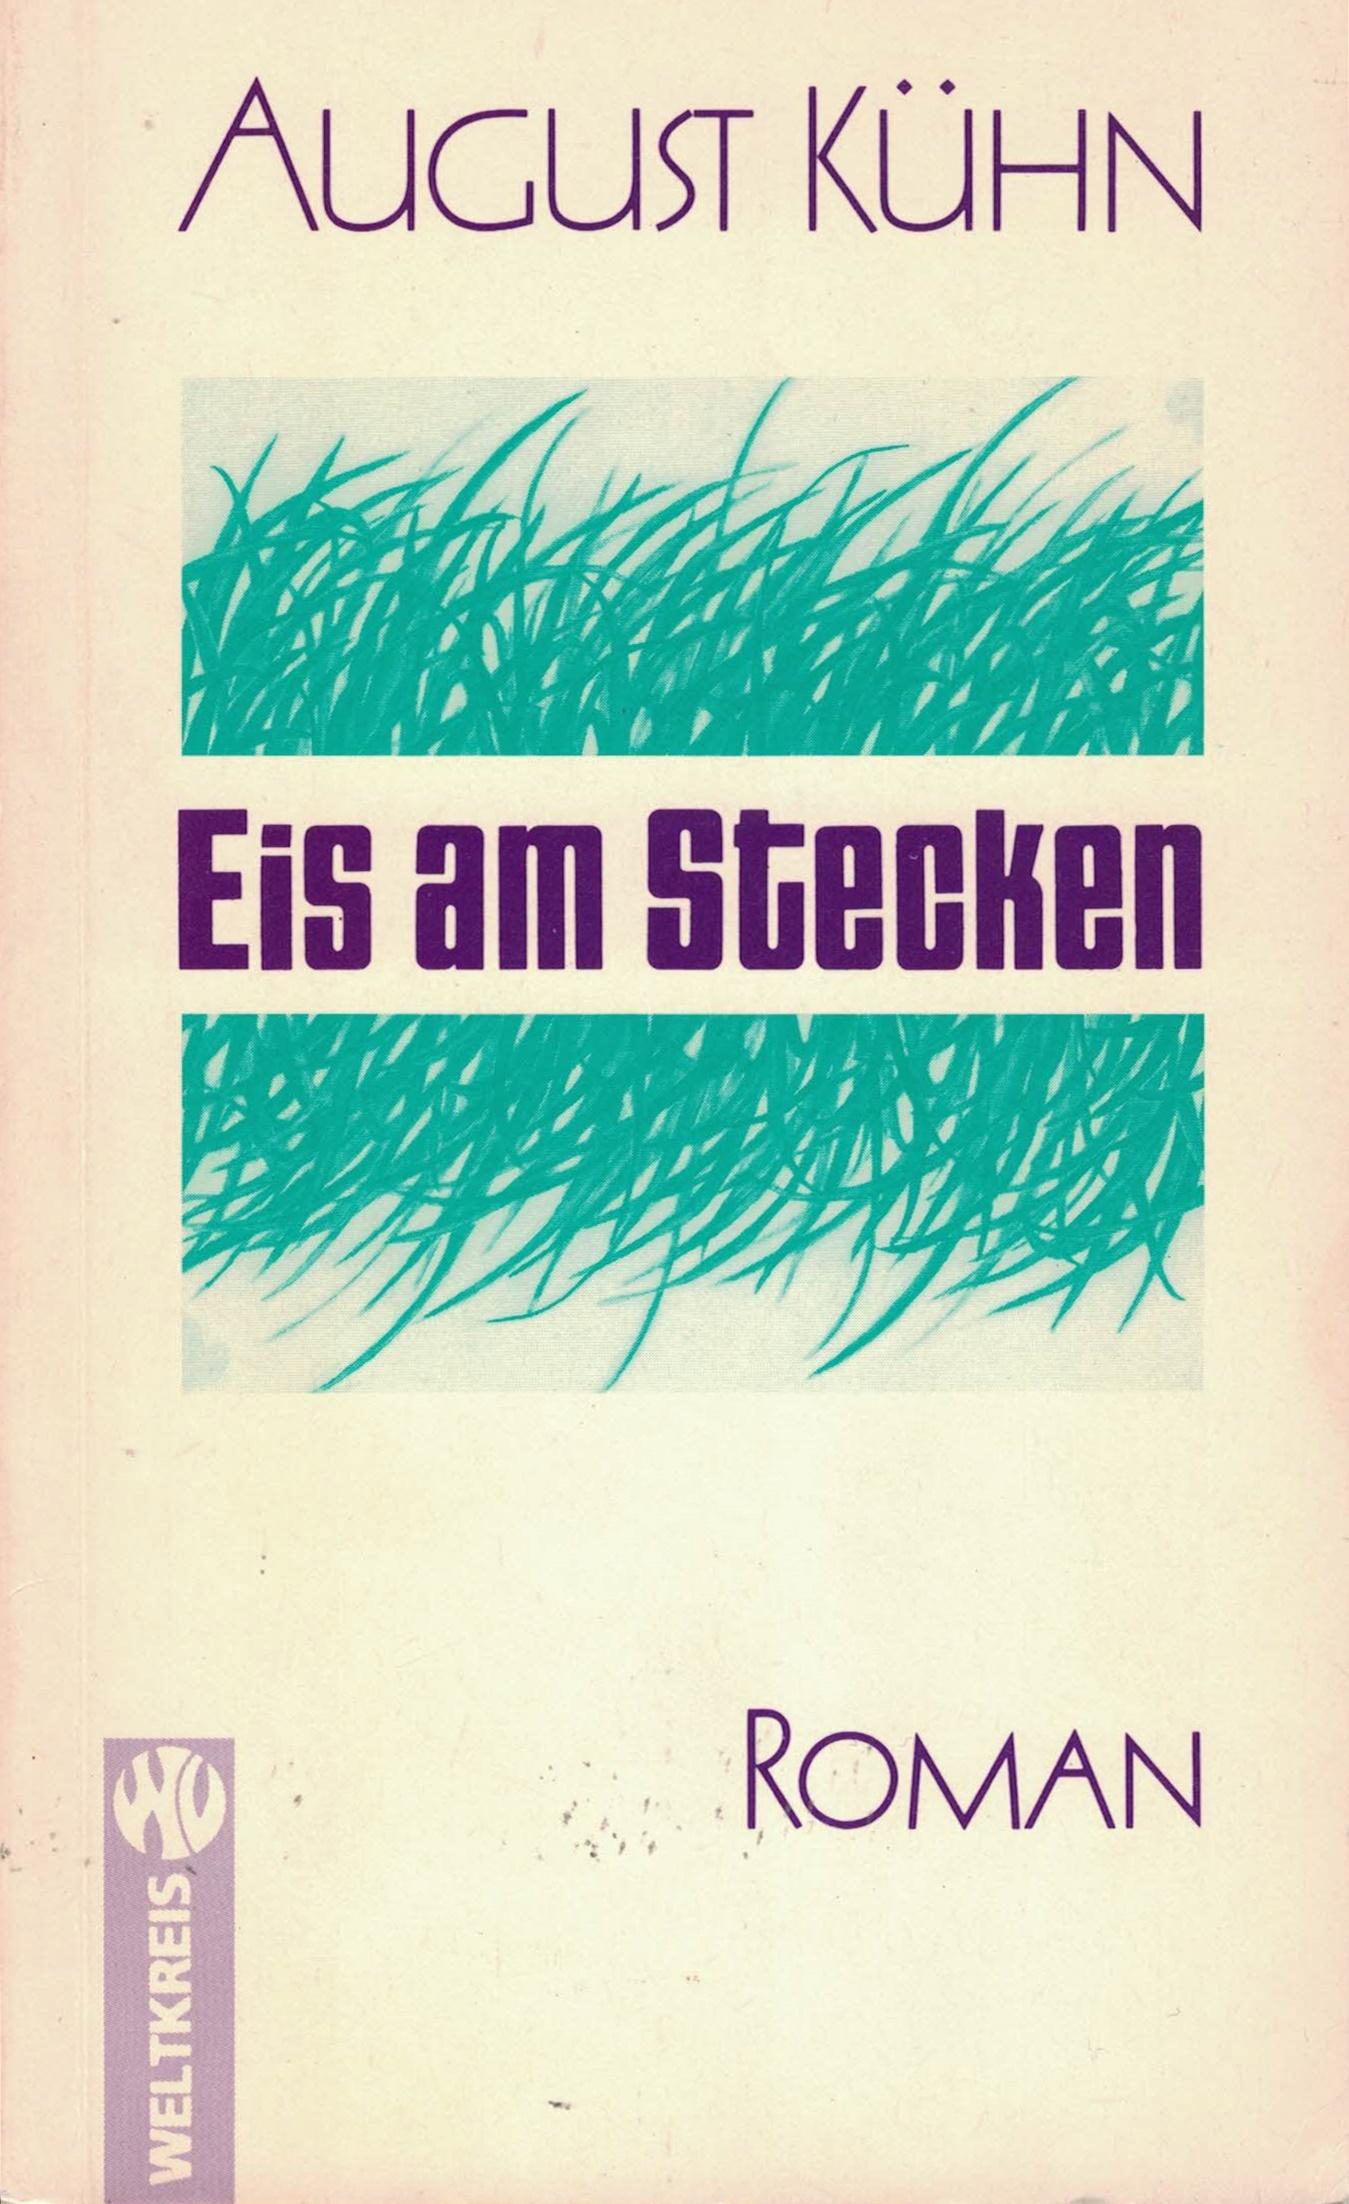 August Kühn - Eis am Stecken - Roman